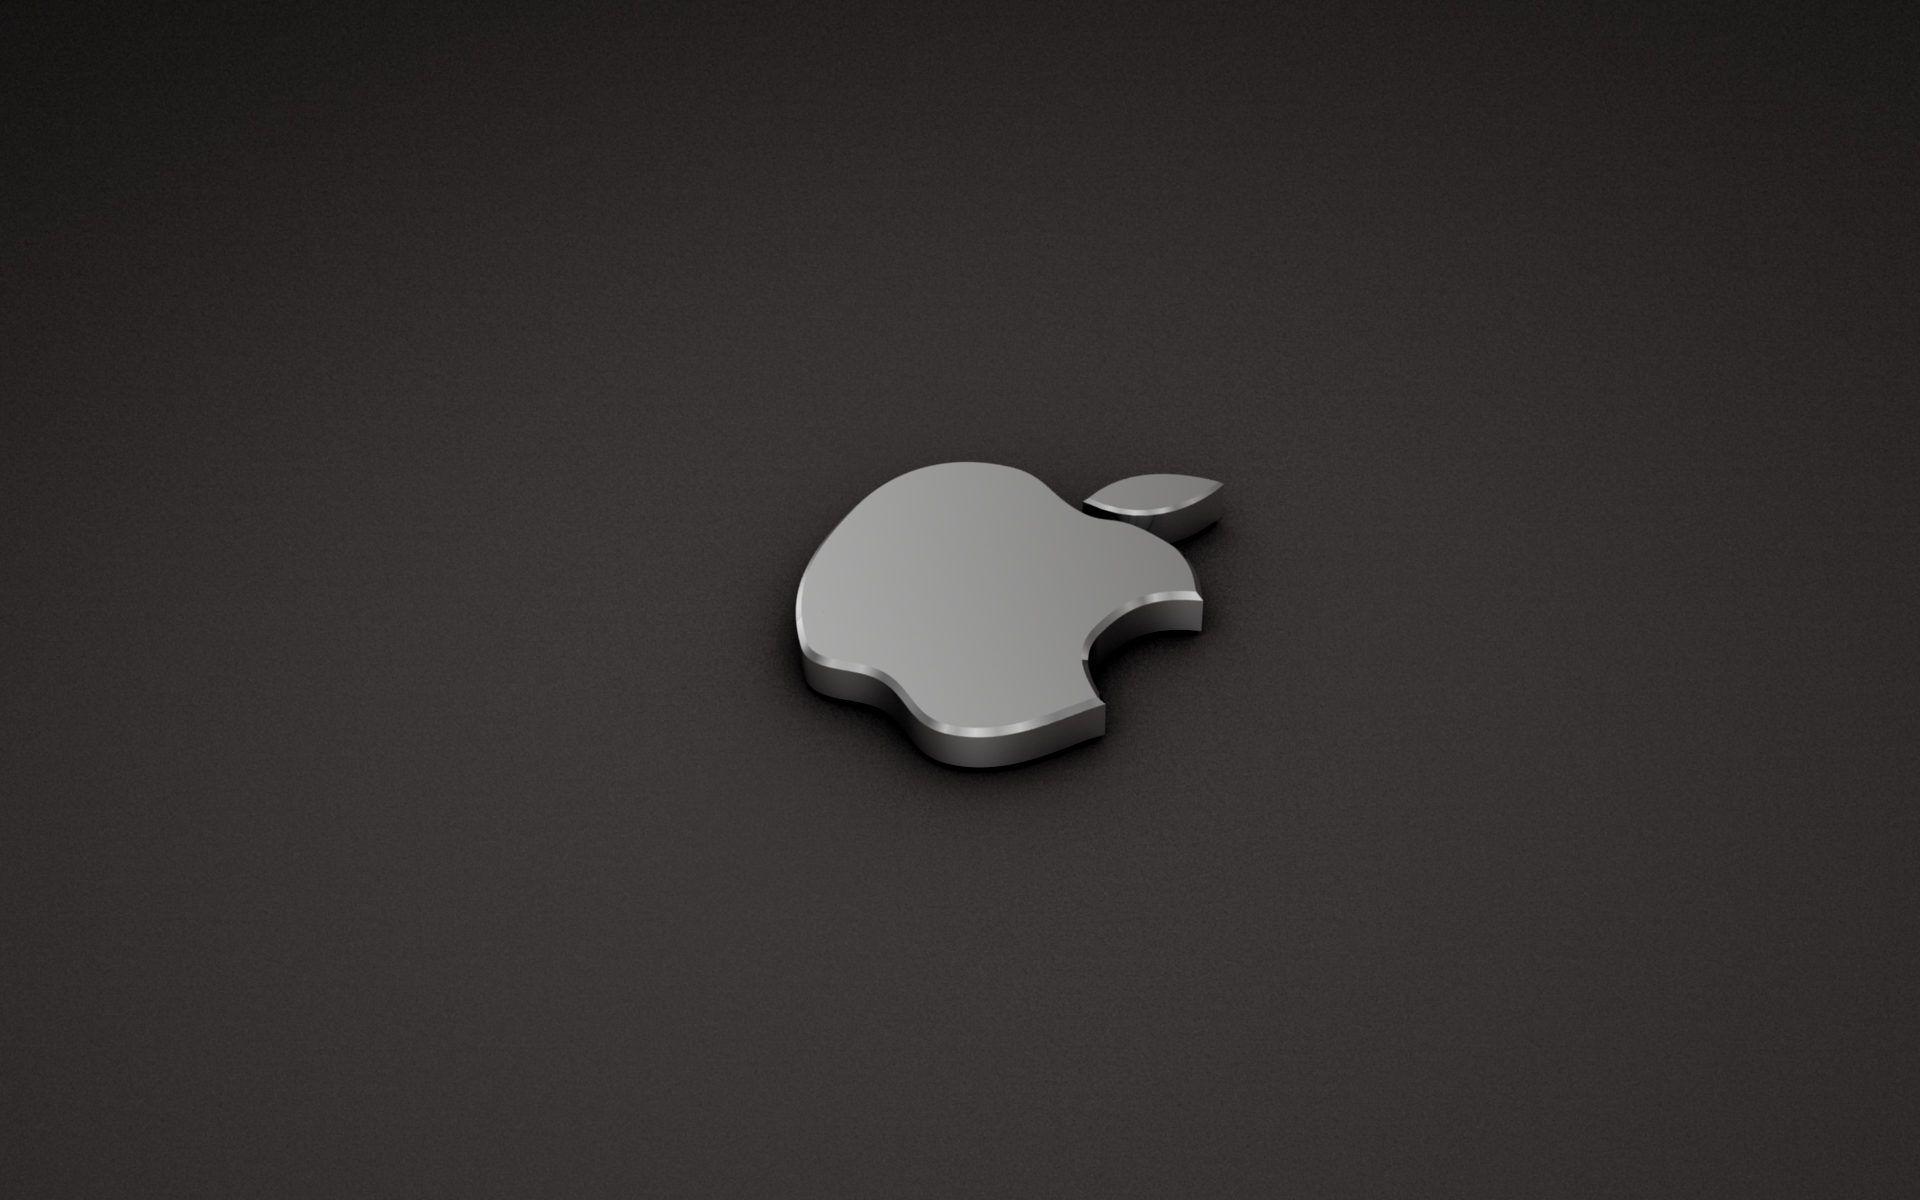 Apple Mac Logo Macintosh Computers HD Wallpapers Desktop